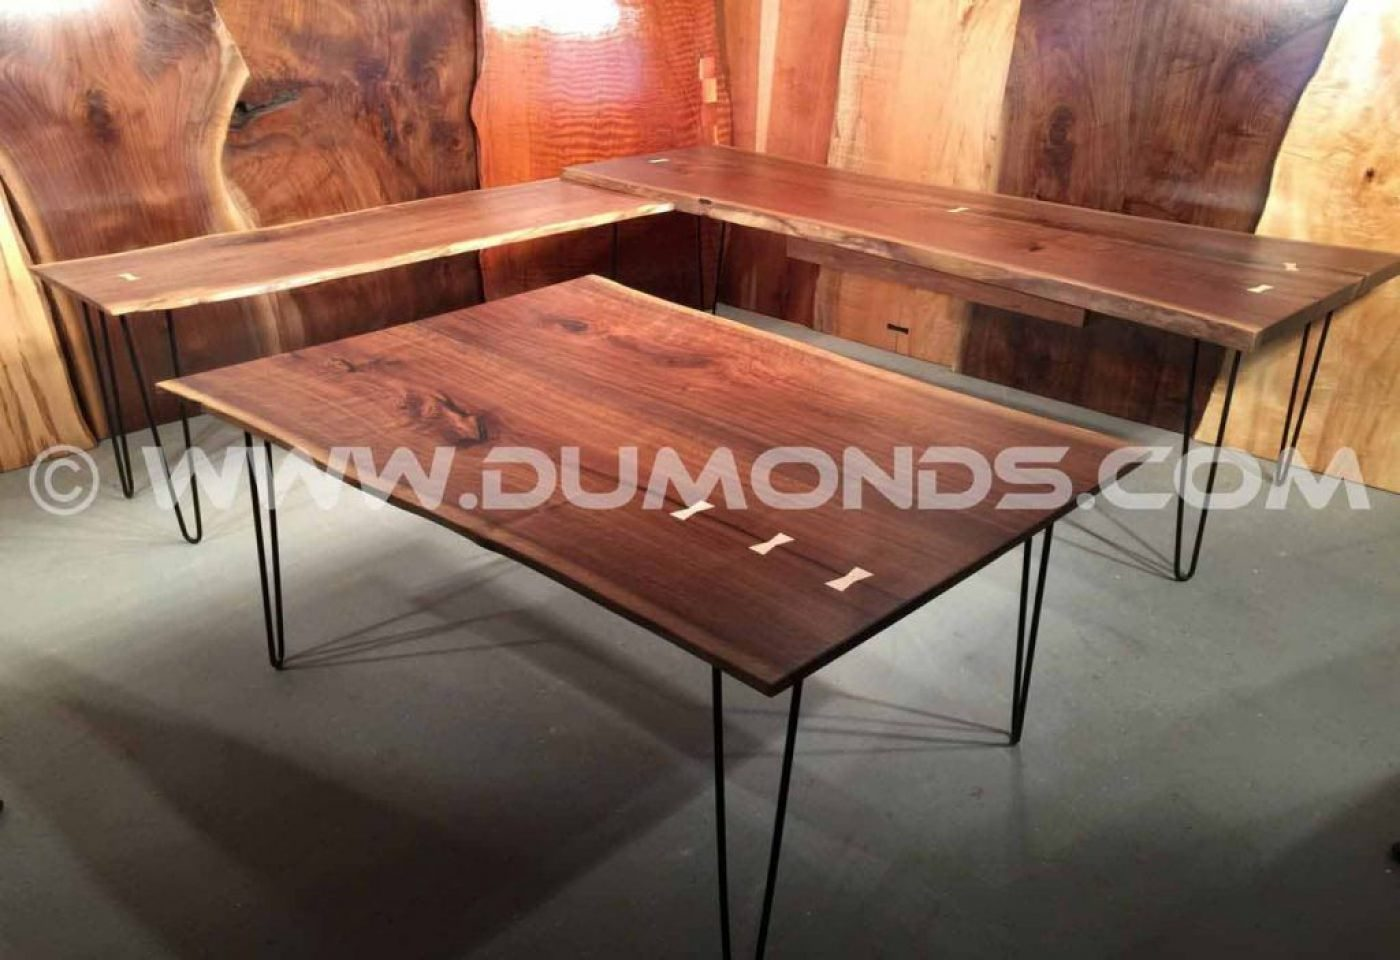 Steel hairpin legs shown under a modular walnut desk